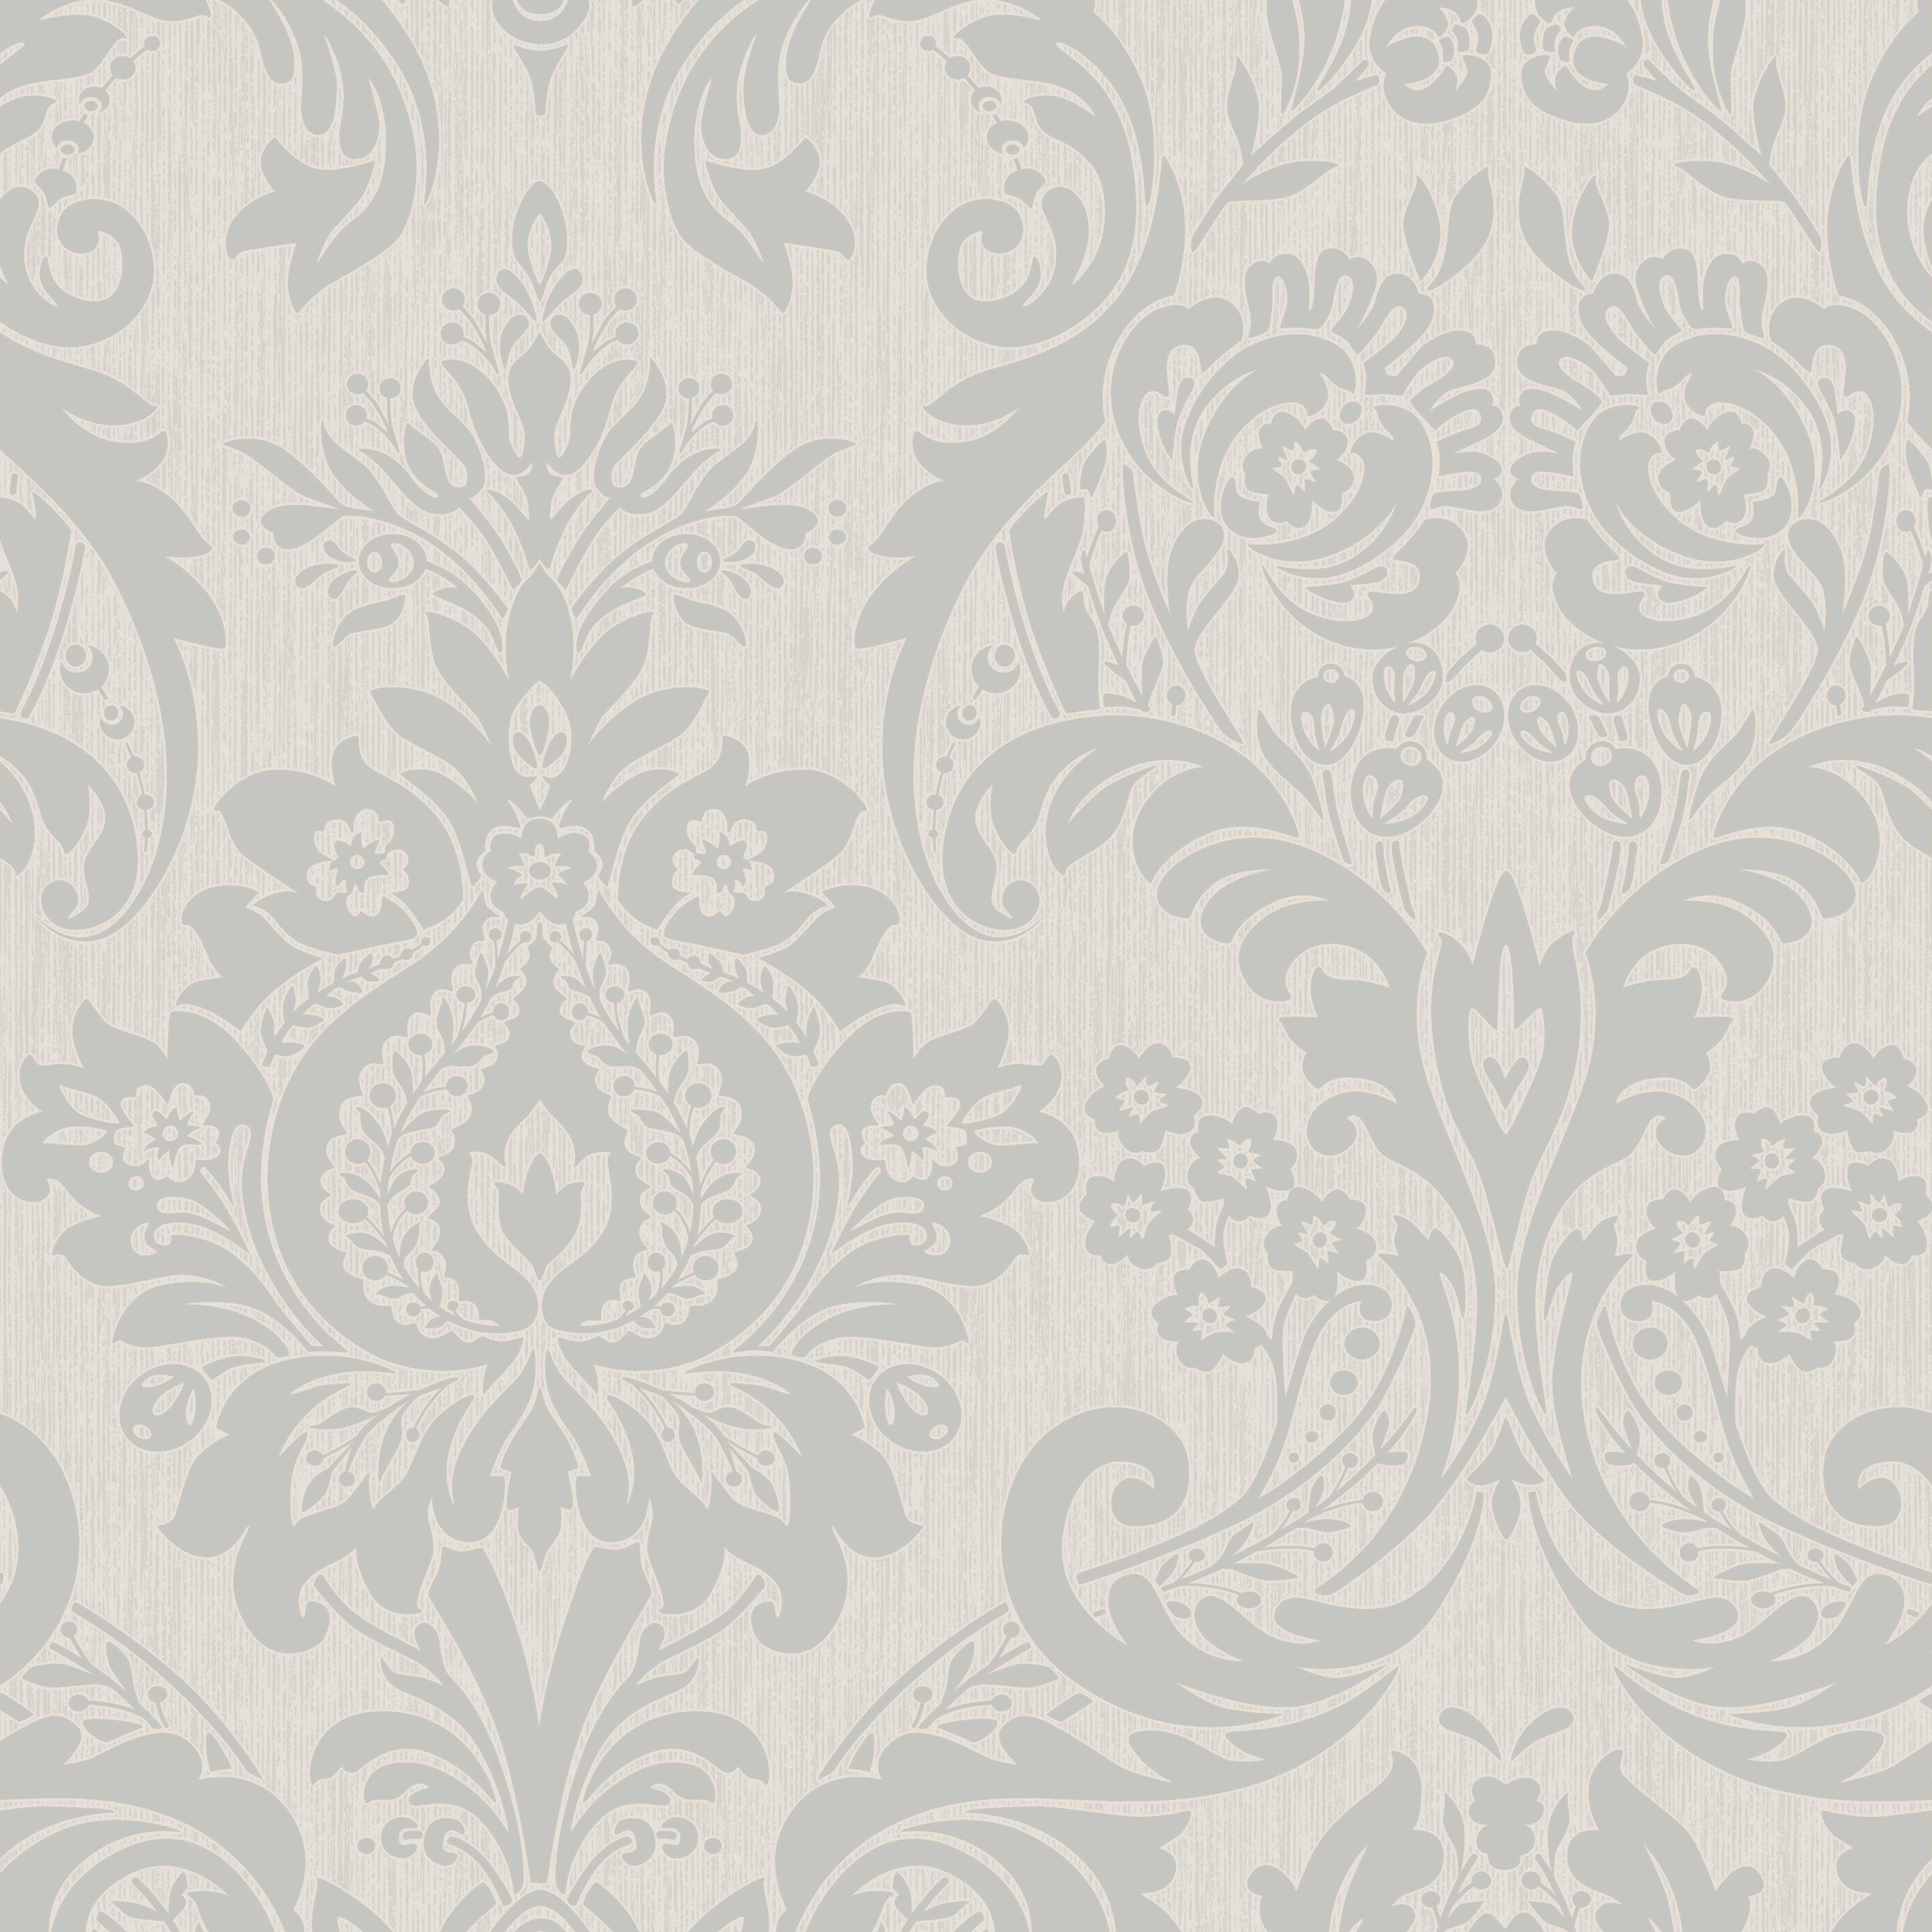 Hermes Silver Damask Wallpaper Departments Diy At B Q Silver